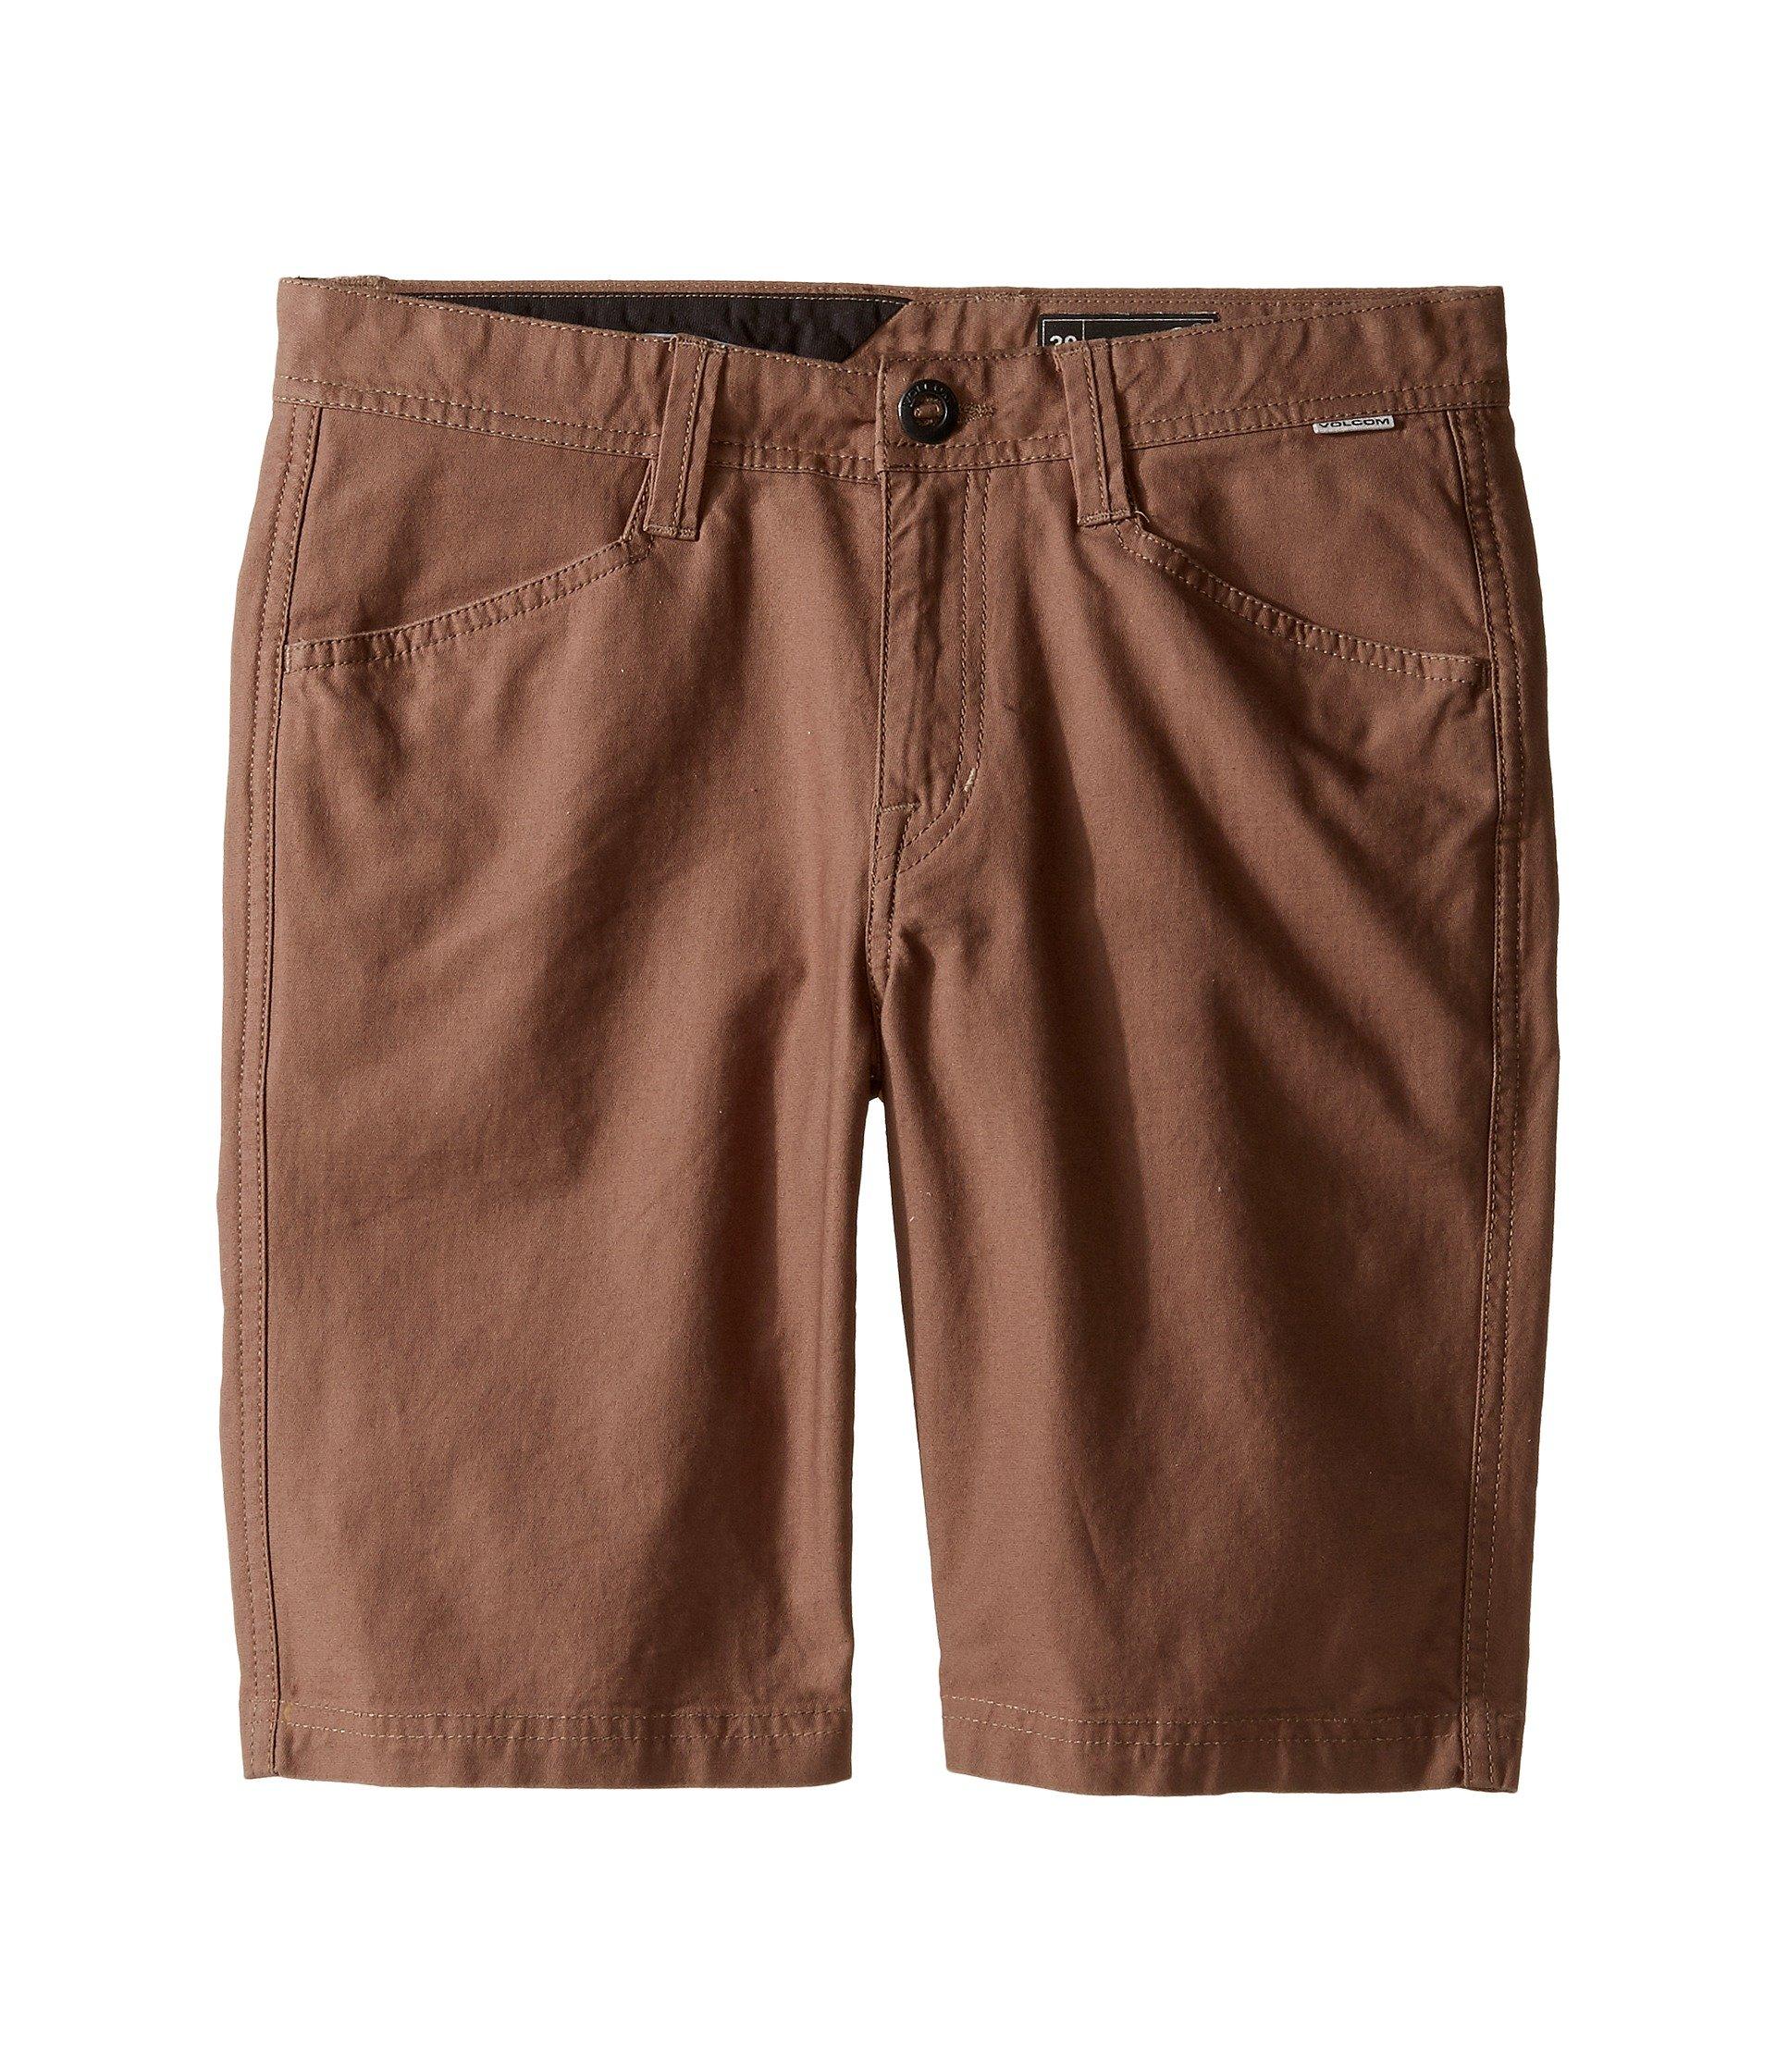 Pantaloneta para Niño Volcom Kids VSM Gritter Shorts (Big Kids)  + Volcom en VeoyCompro.net